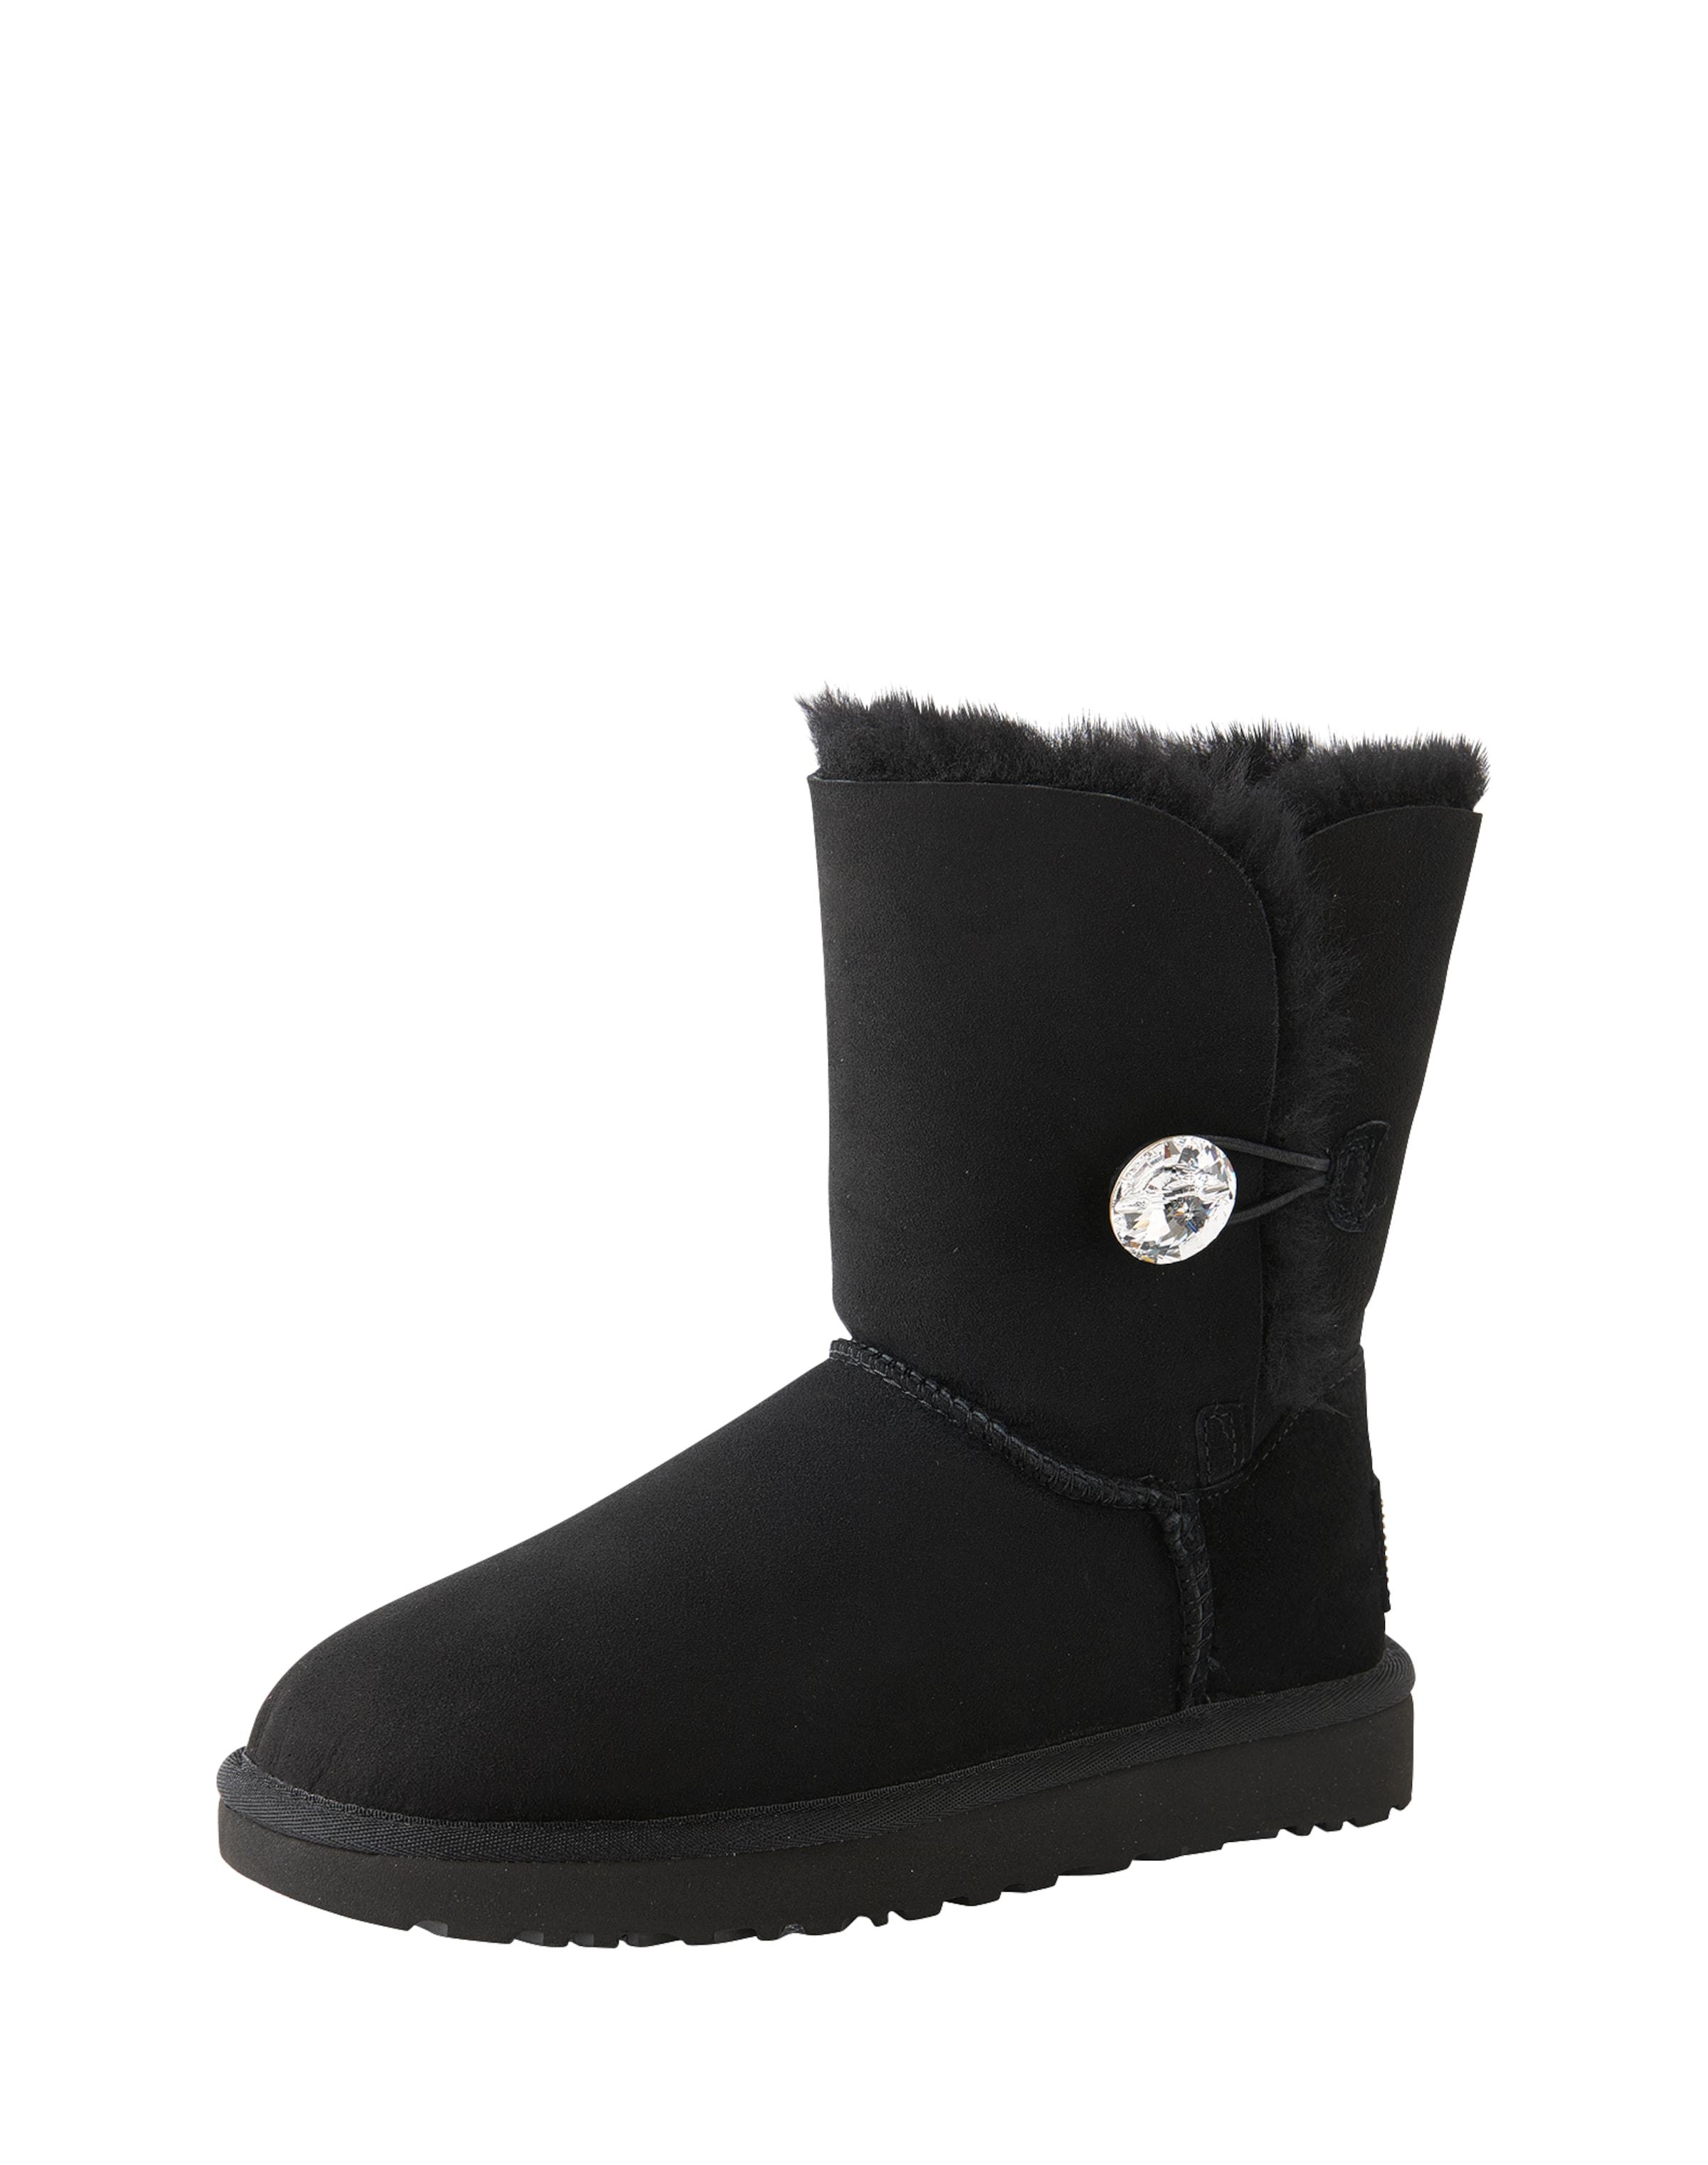 Ugg In Boots Ugg Boots Schwarz Ugg Ugg Schwarz In In Boots Schwarz Boots wXuOkiZPT